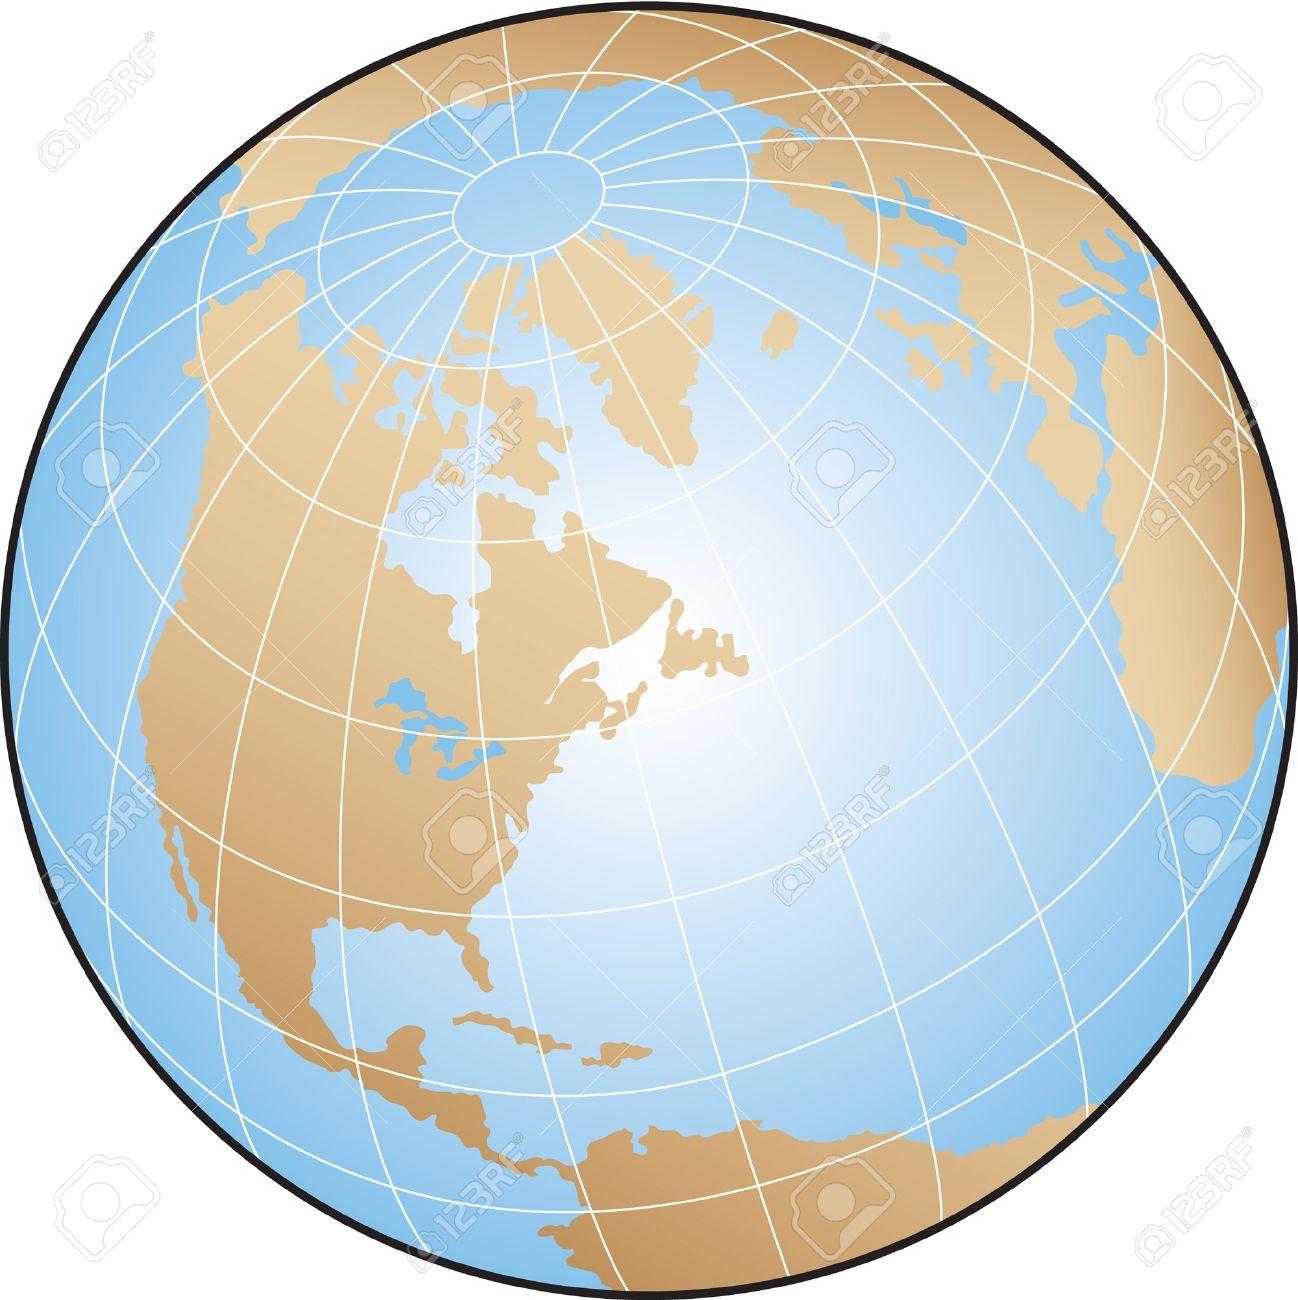 World Globe Illustration Focusing On North America With Lines.